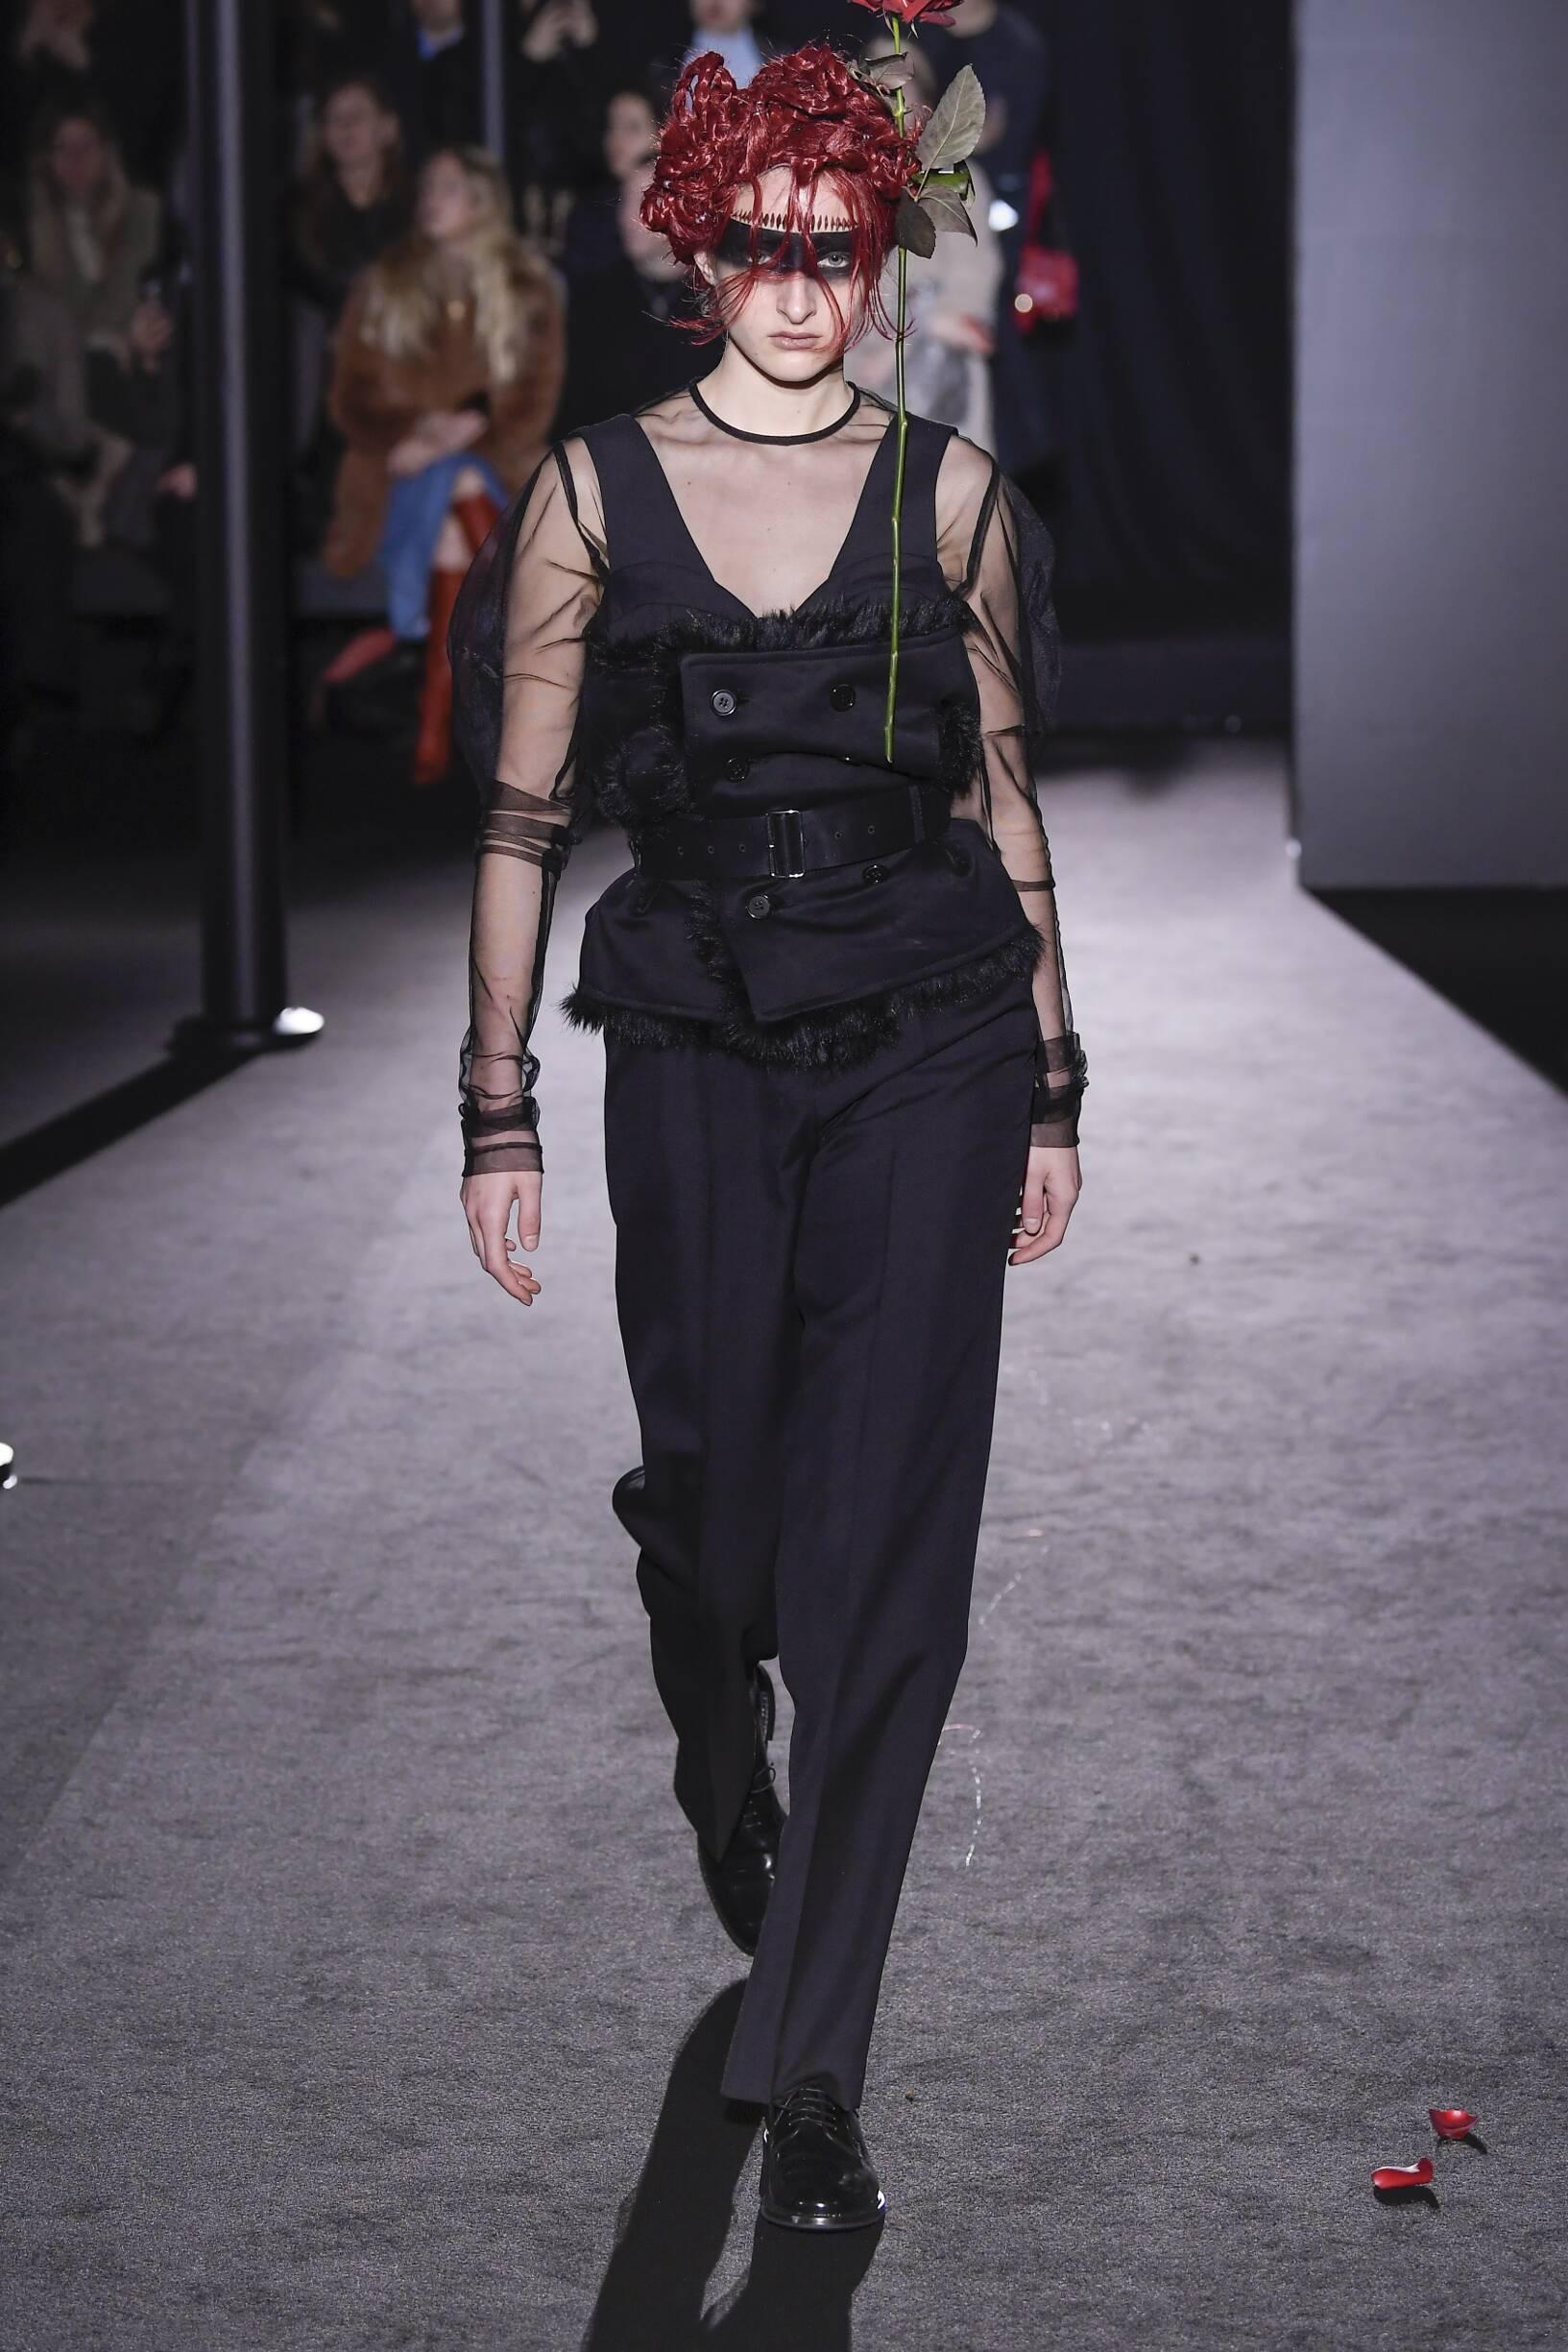 Fall 2019 Fashion Trends Noir Kei Ninomiya